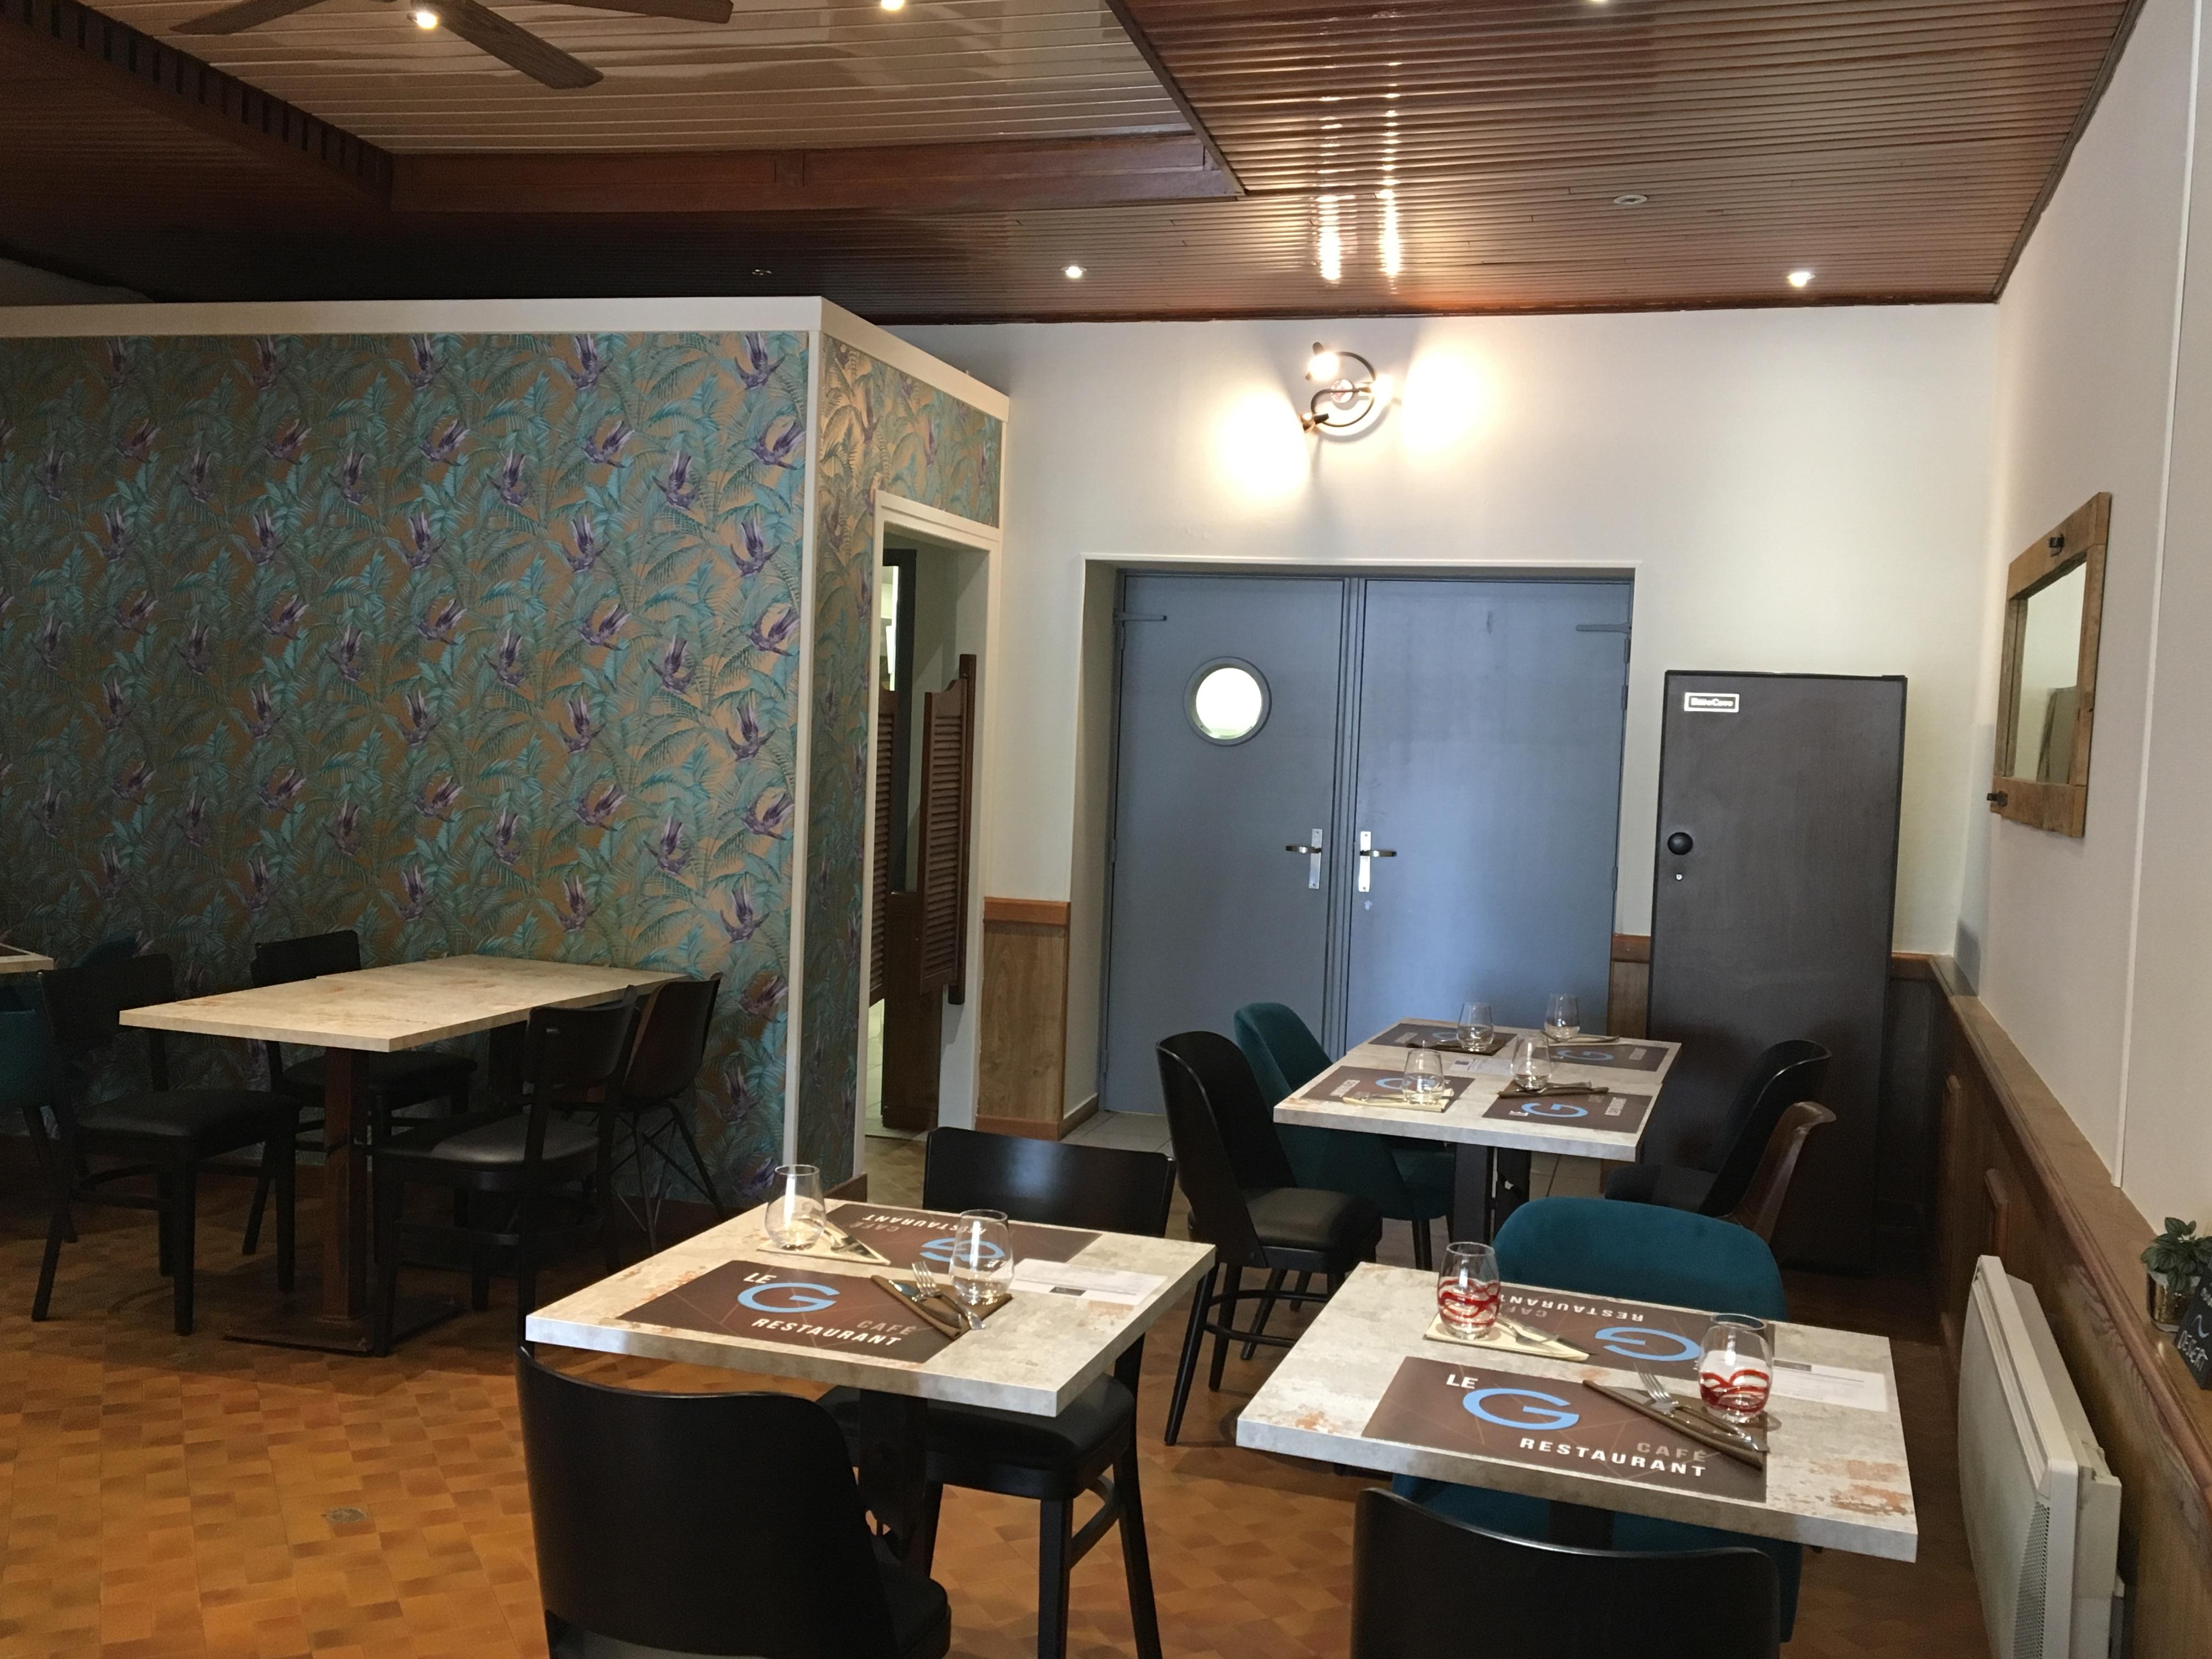 Restaurant le G - Salle